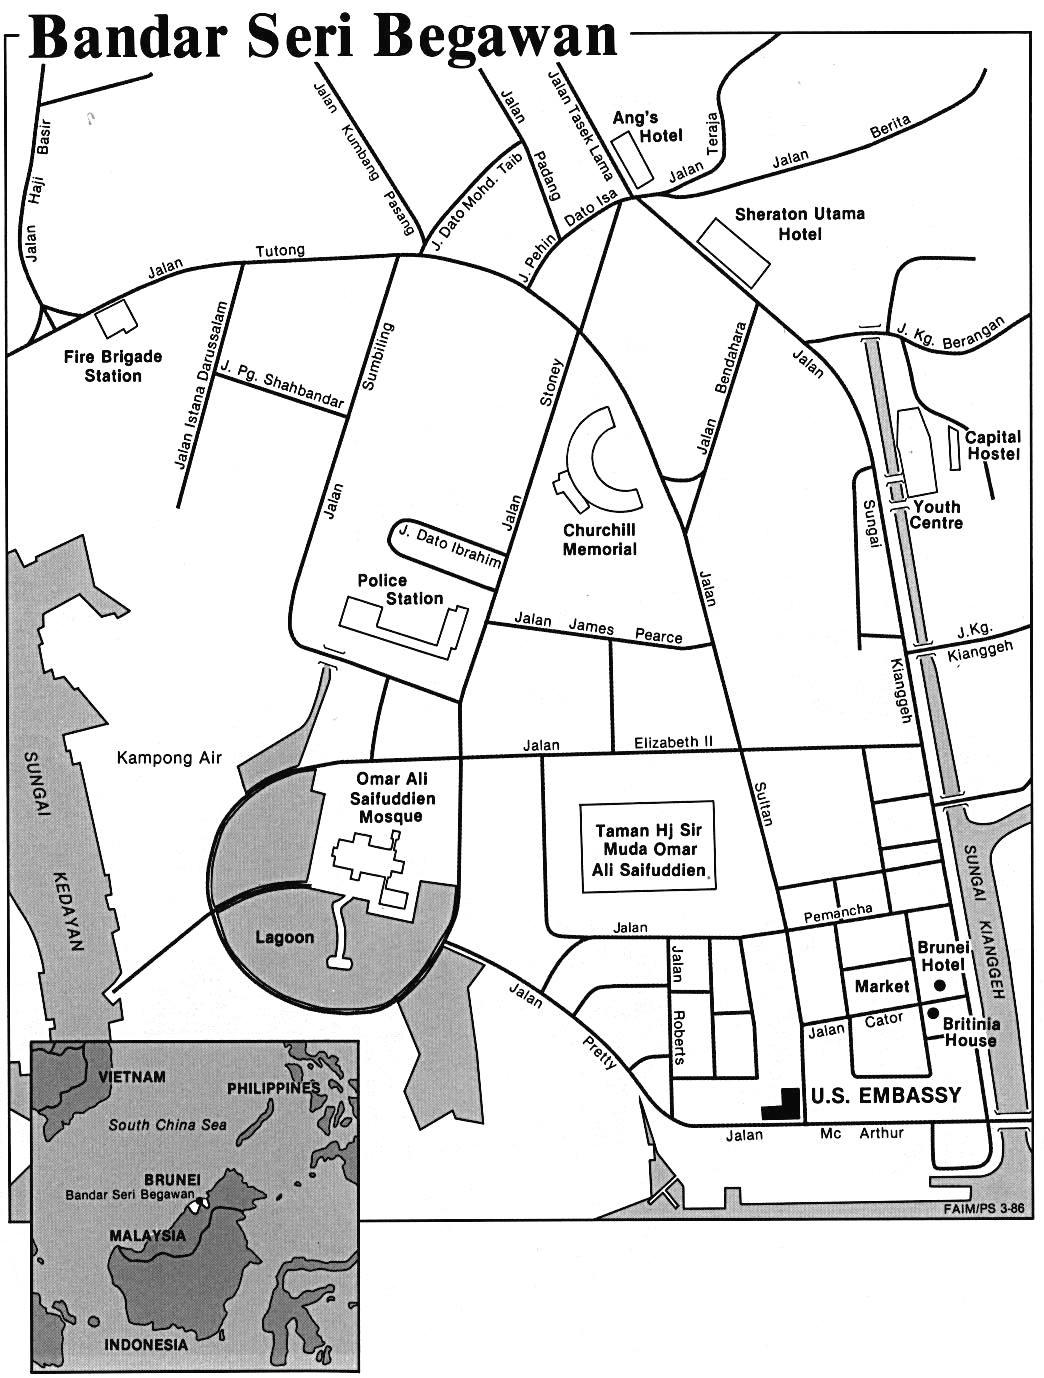 Bandar Seri Begawan city Map mappery